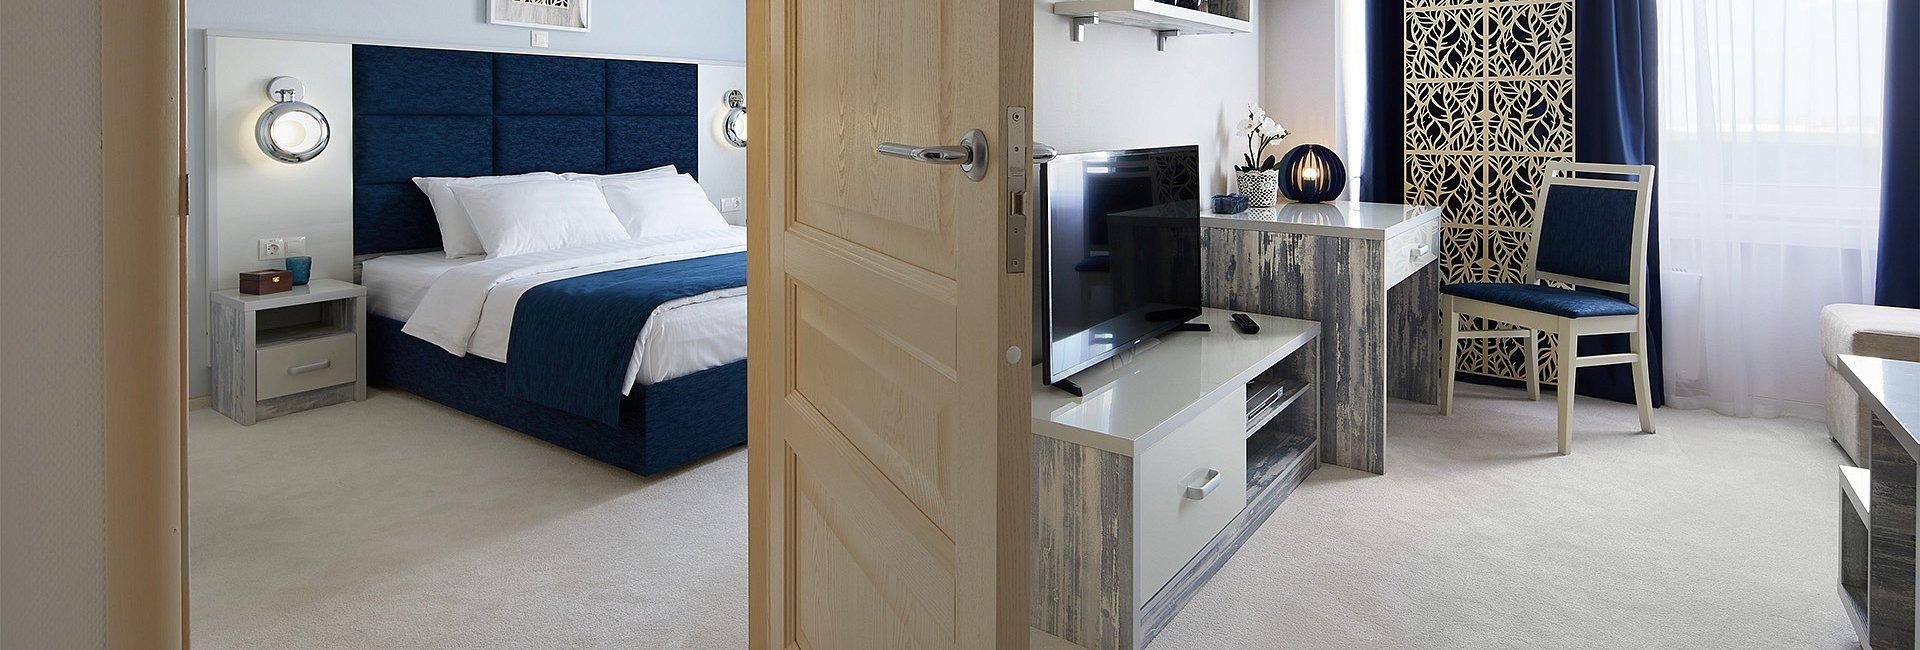 The official website of the Izmailovo Hotel Complex (Gamma